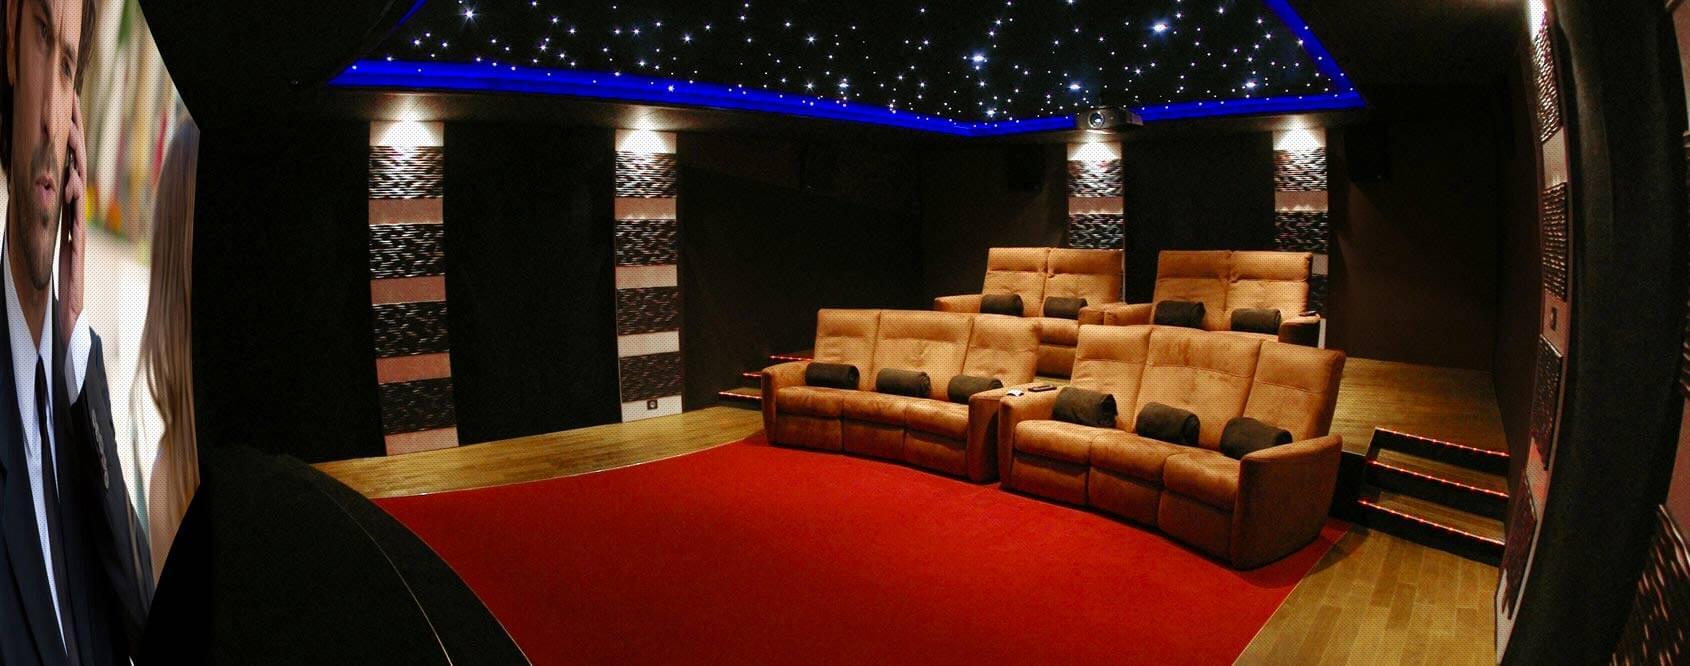 hocinema l 39 expert de la salle de cin ma priv e la maison. Black Bedroom Furniture Sets. Home Design Ideas